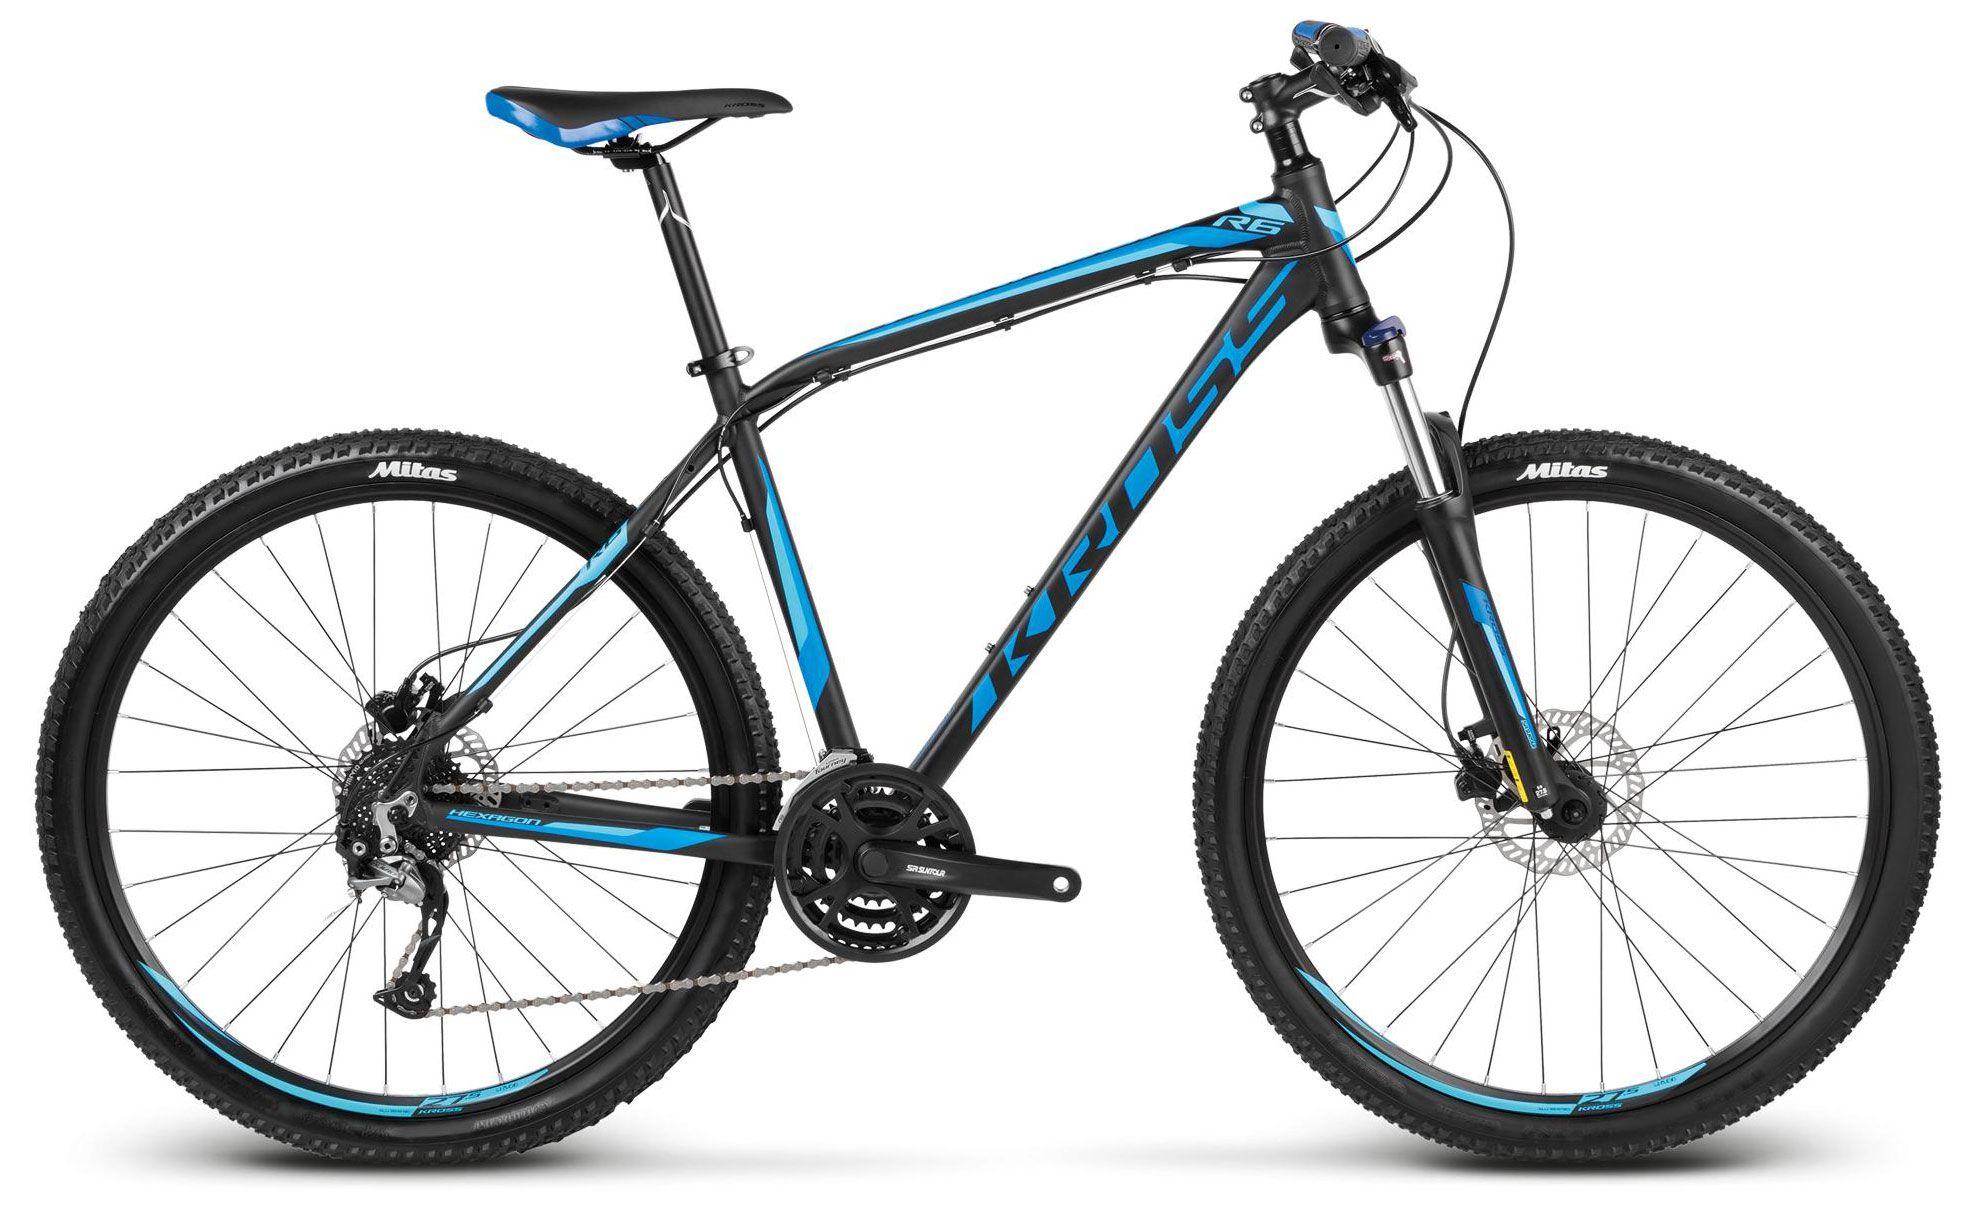 Велосипед KROSS Hexagon R6 2017 велосипед kross hexagon r6 2015